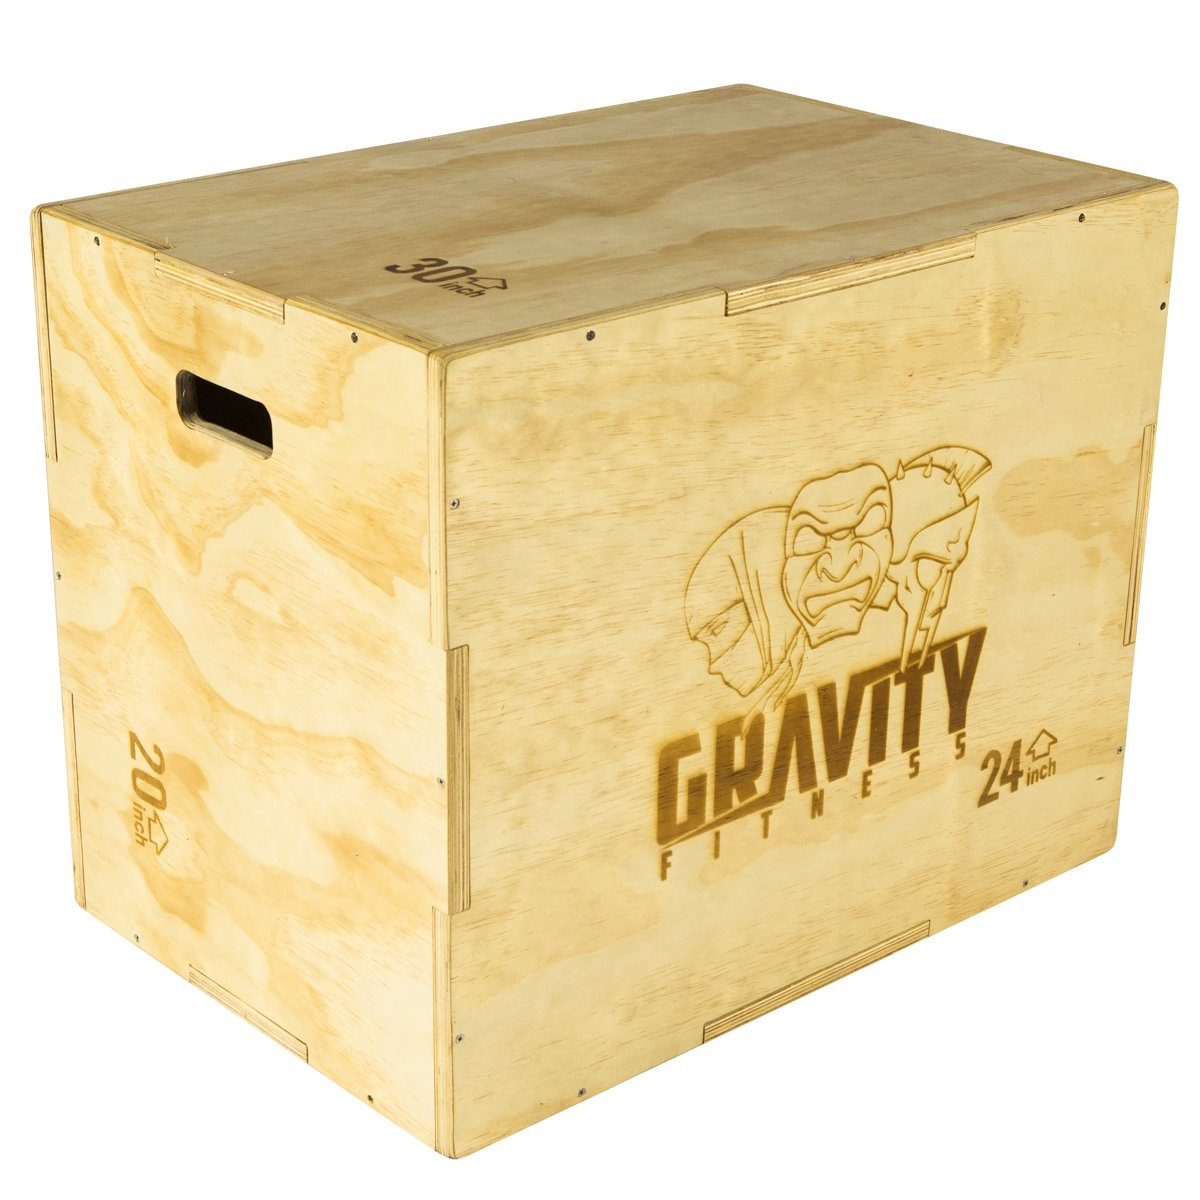 Gravity Fitness 3-in-1 Plyometrischer Sprungkasten